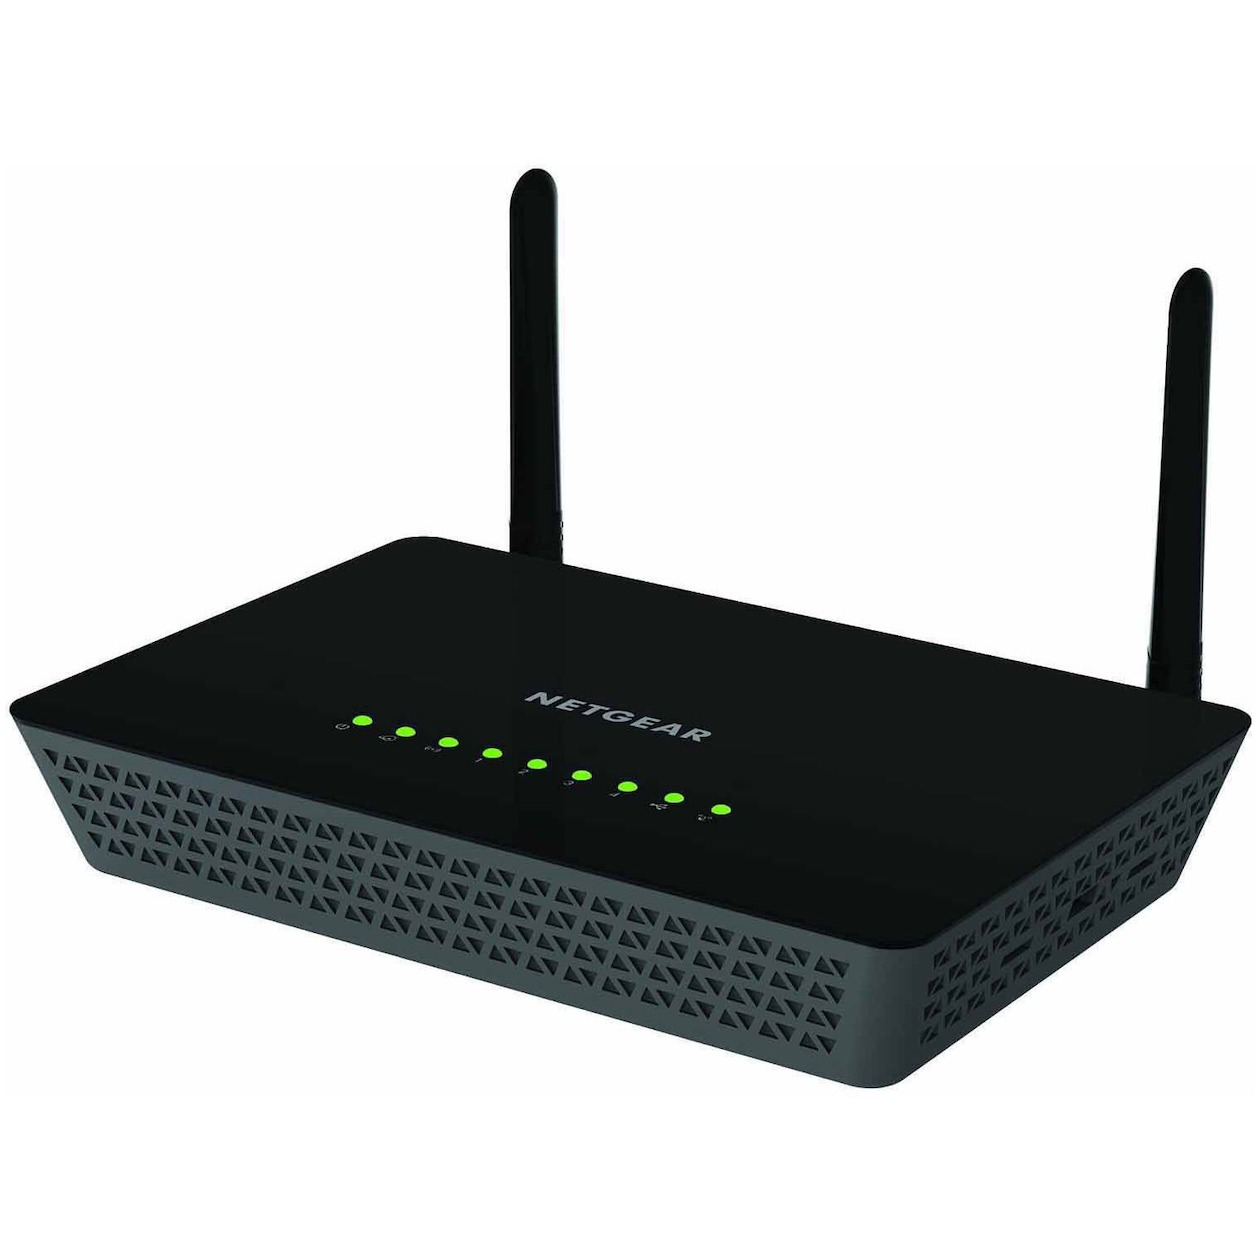 Netgear router R6220 100PES